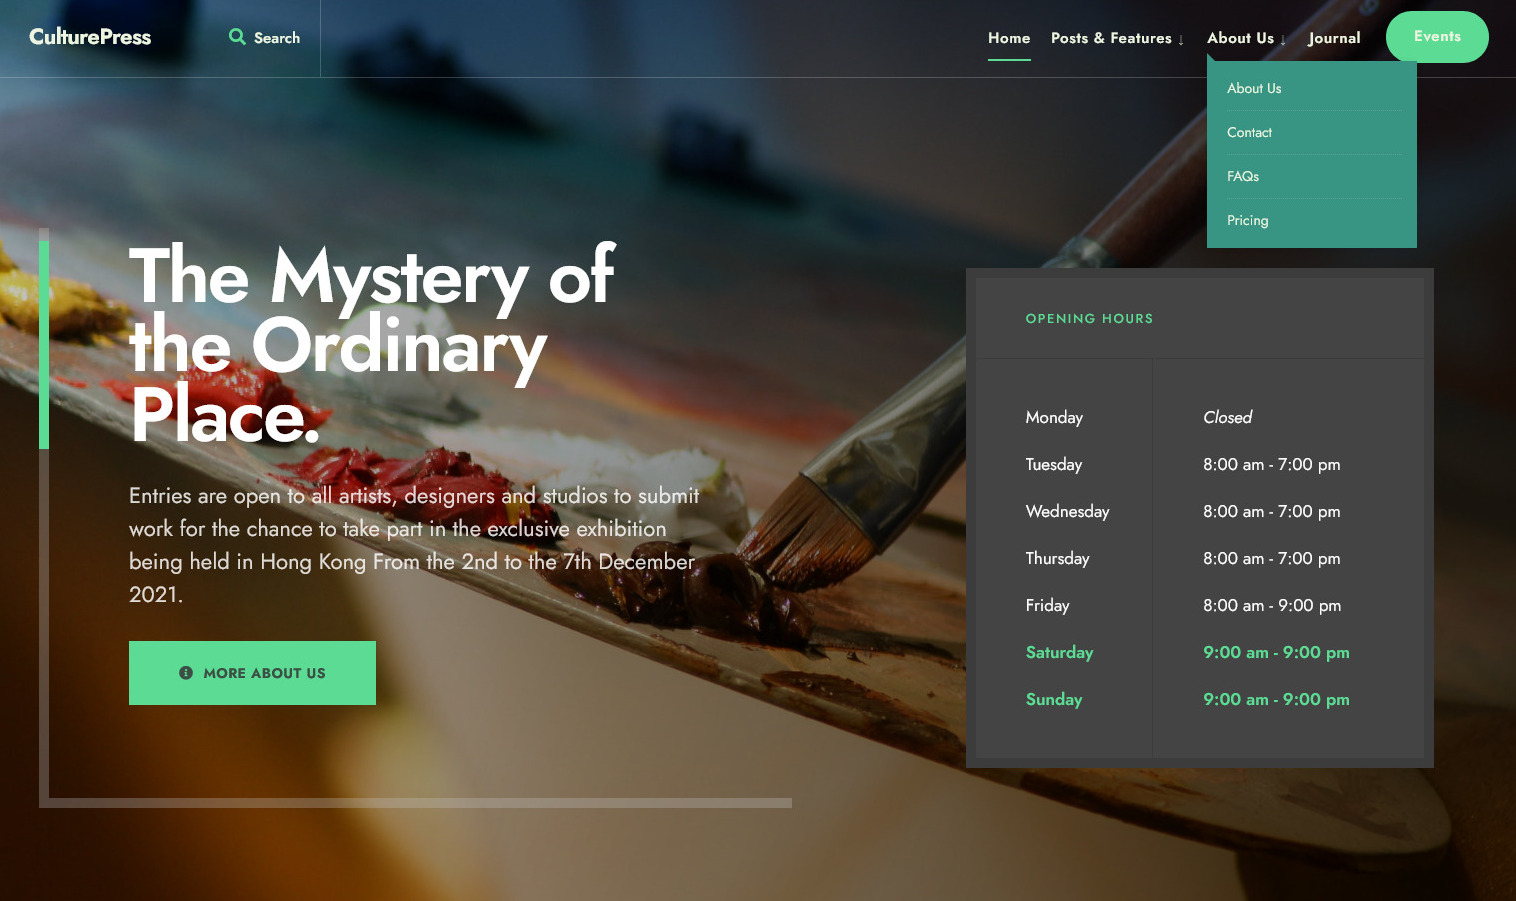 CulturePress Arts and Culture WordPress Theme